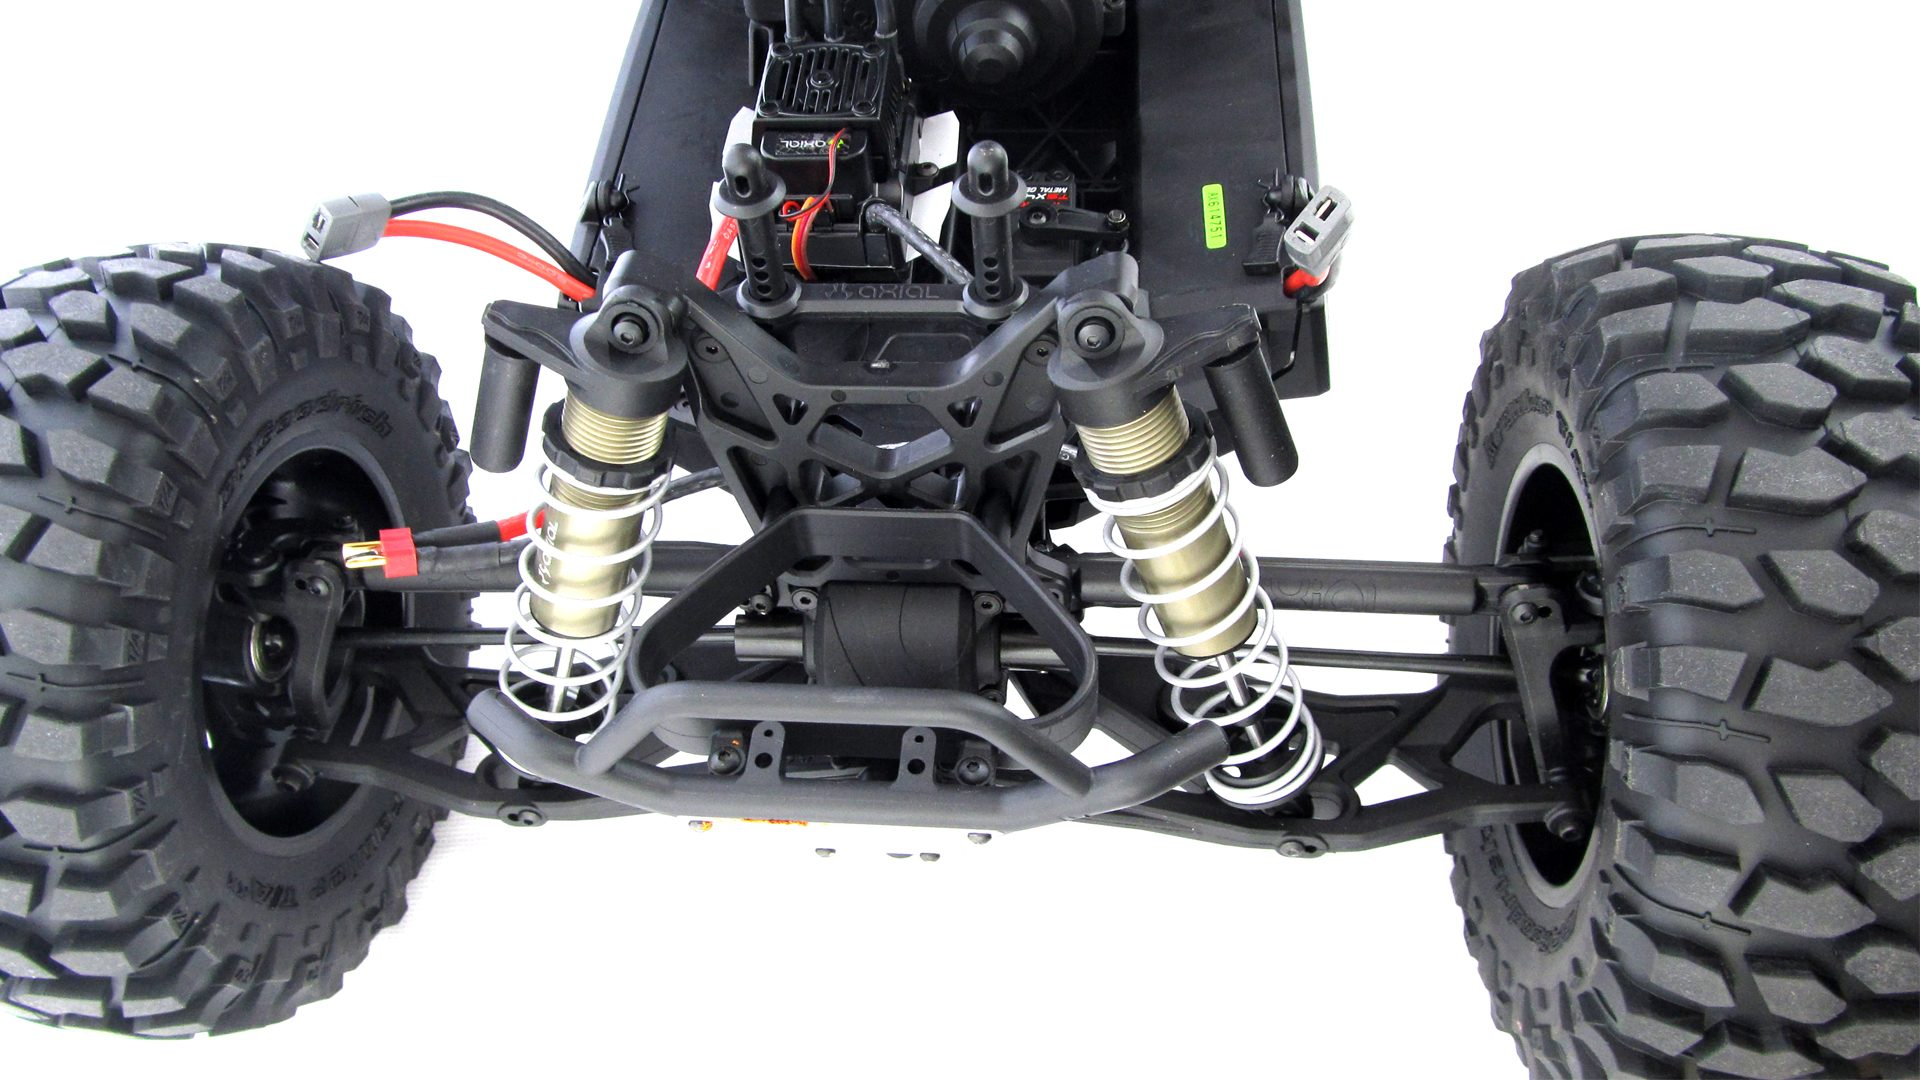 Yeti-Reifen-Motor-Aufhaengung_9